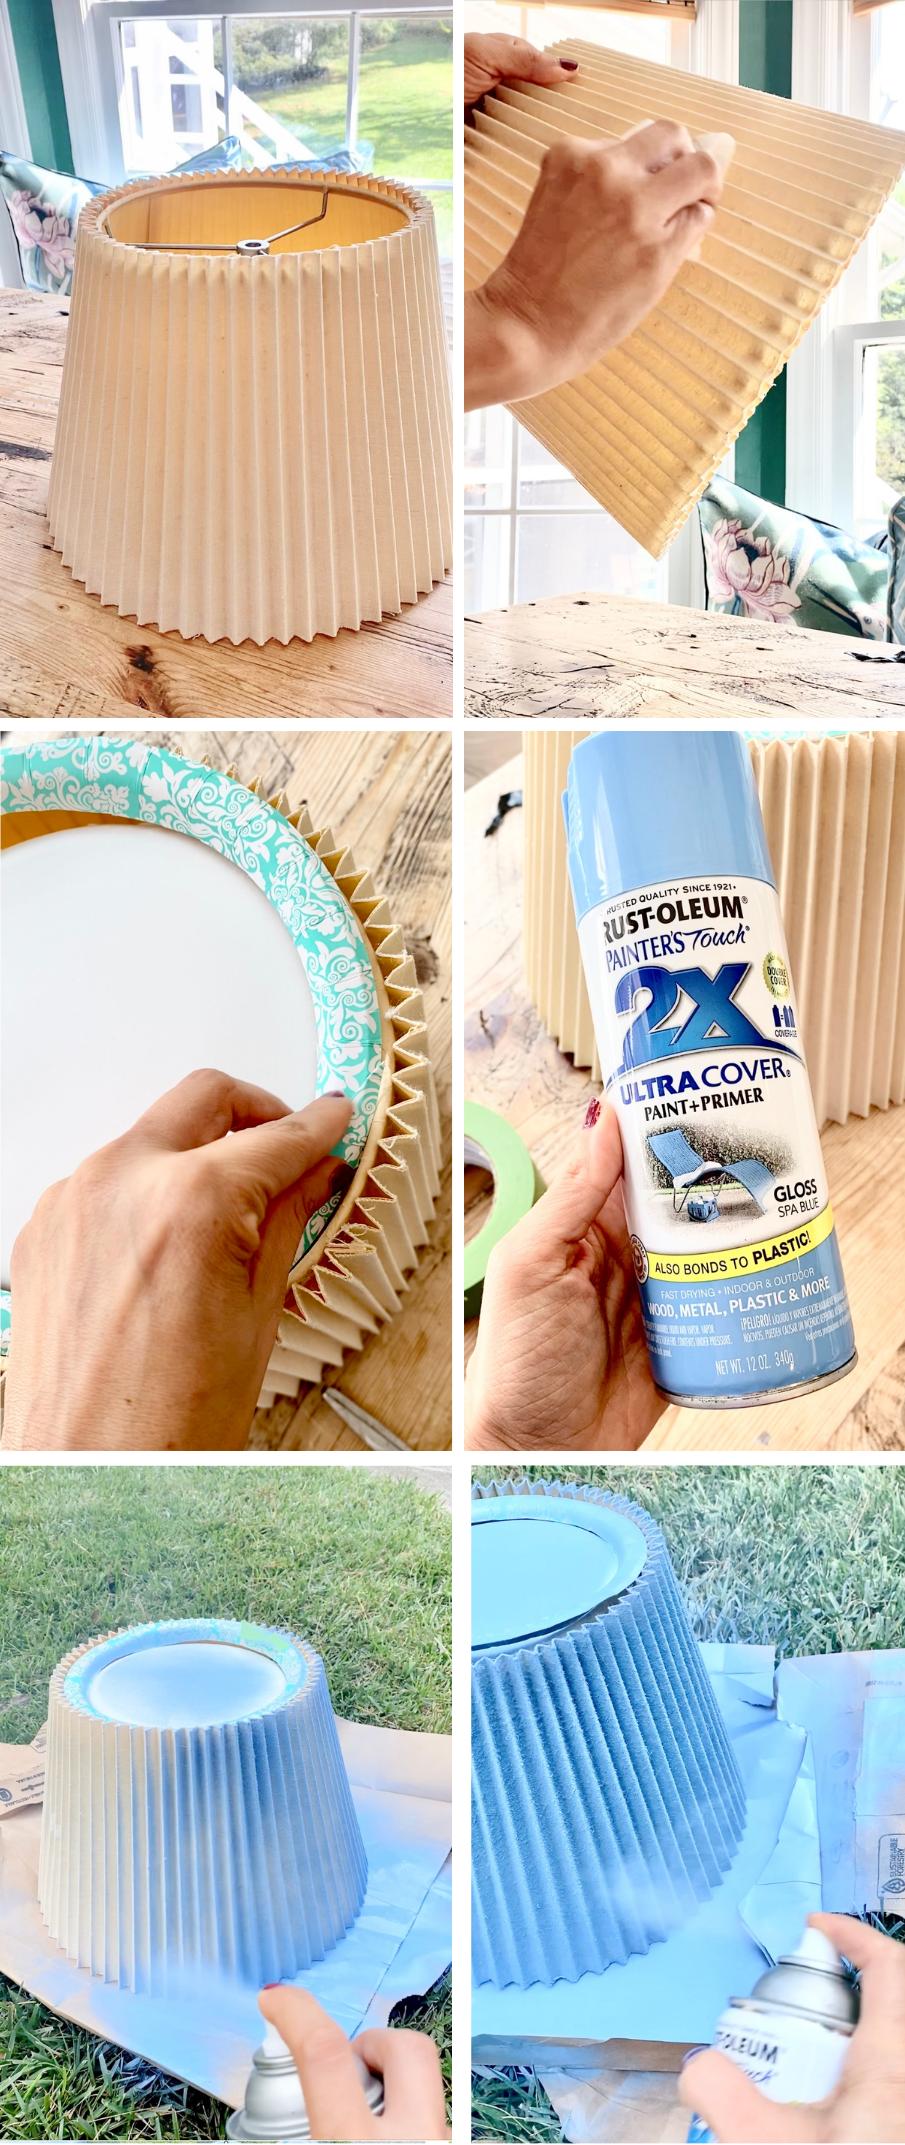 Spray-painting-fabric-pleated-lamp-shade